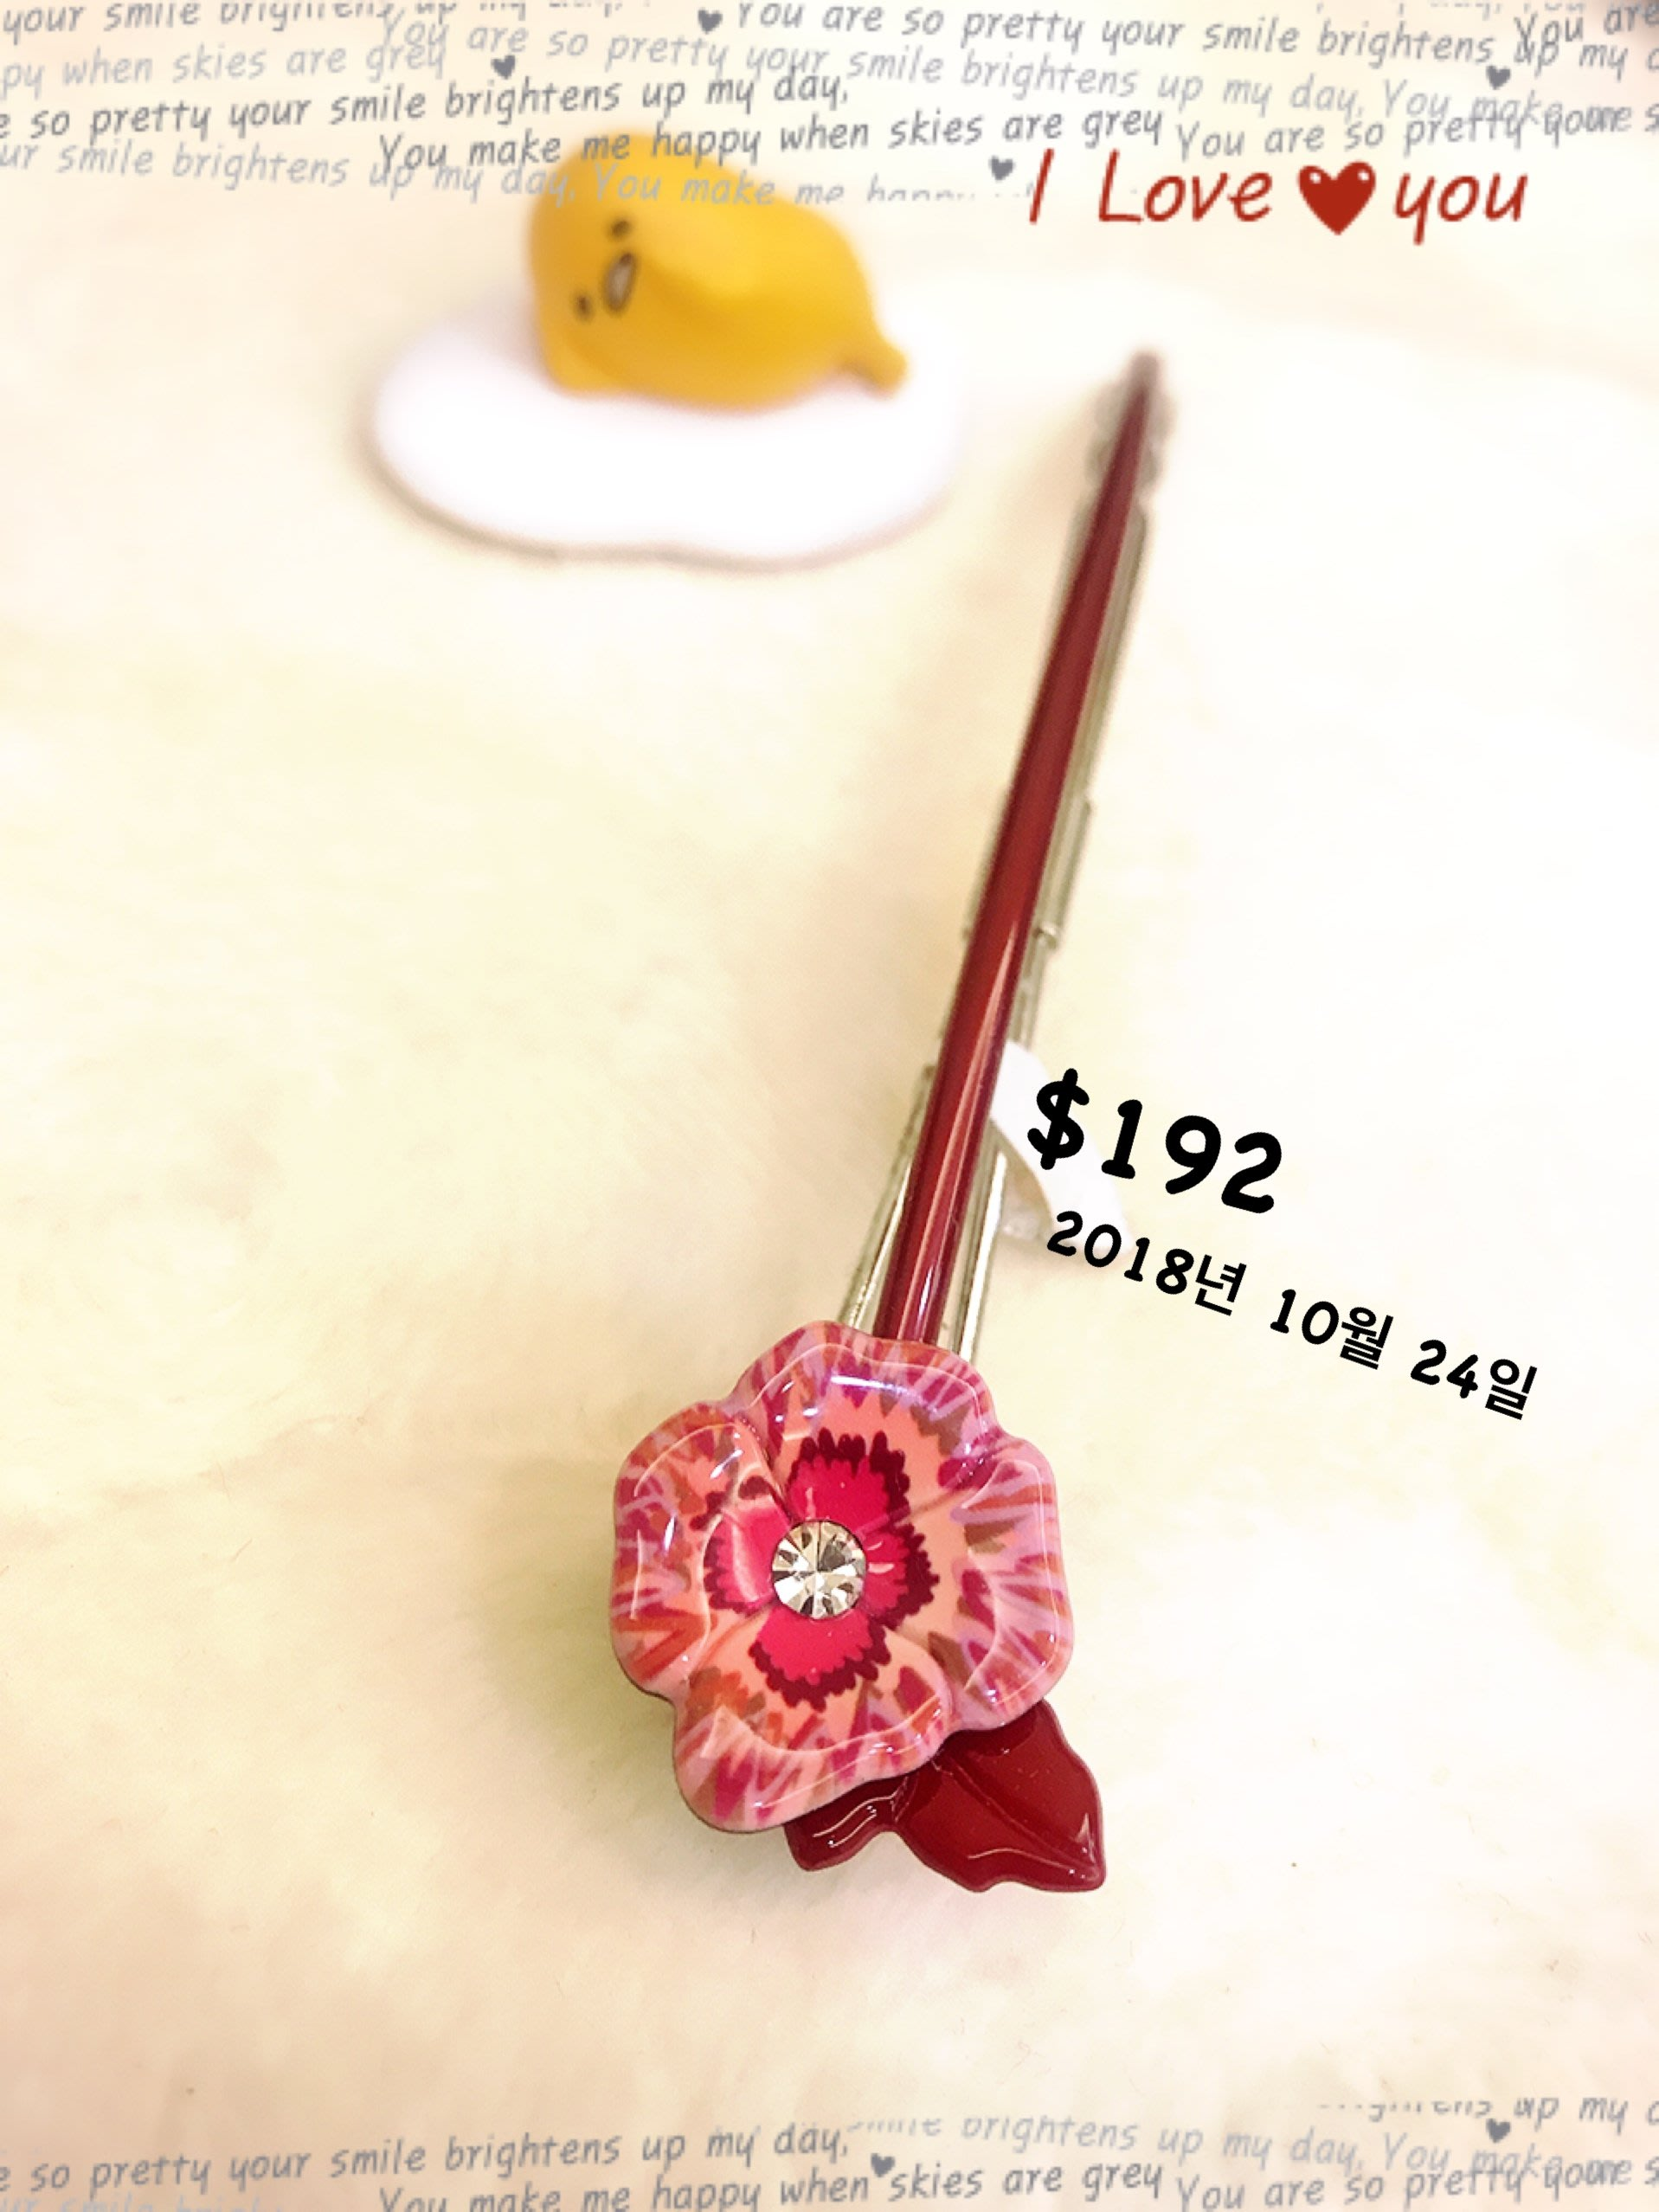 1024~Grain de beaute 妍選精品~ 杜鵑花朵純飽色酒紅長扣夾 $192 起標